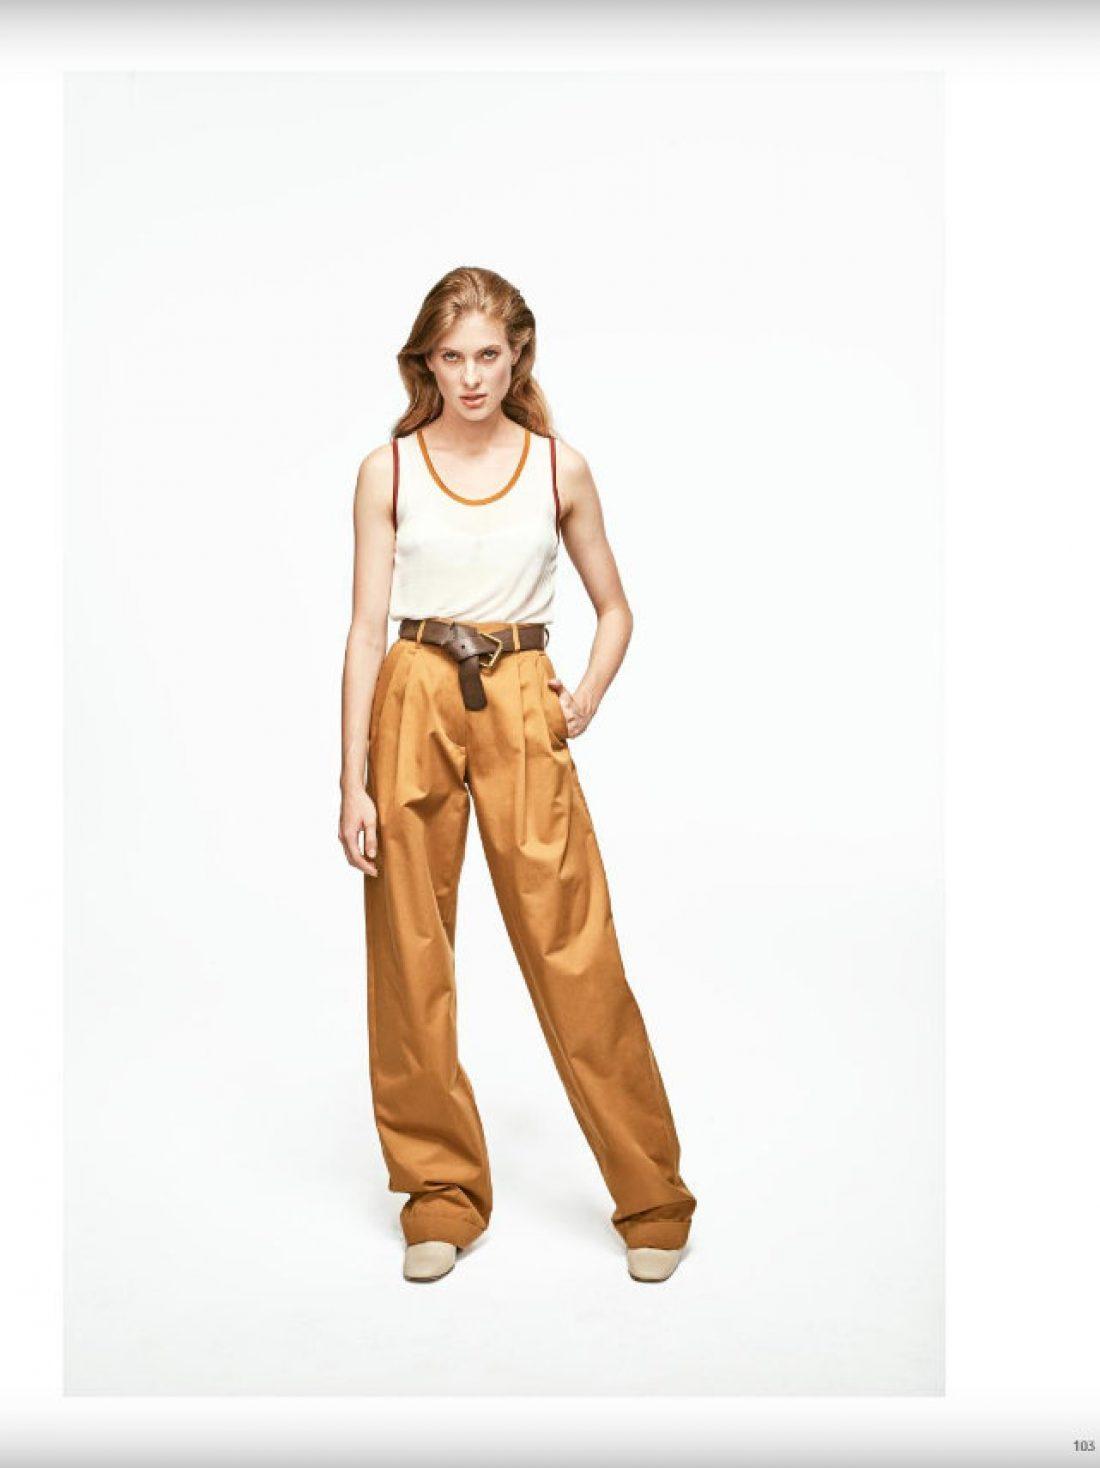 Hannah C. photographed for #BLKONBLK12 by Charles Howells , Fashion: Rachael Churchward ; Hair Greg Murrell at Ryder Salon; Mua Sharlene Cassidy